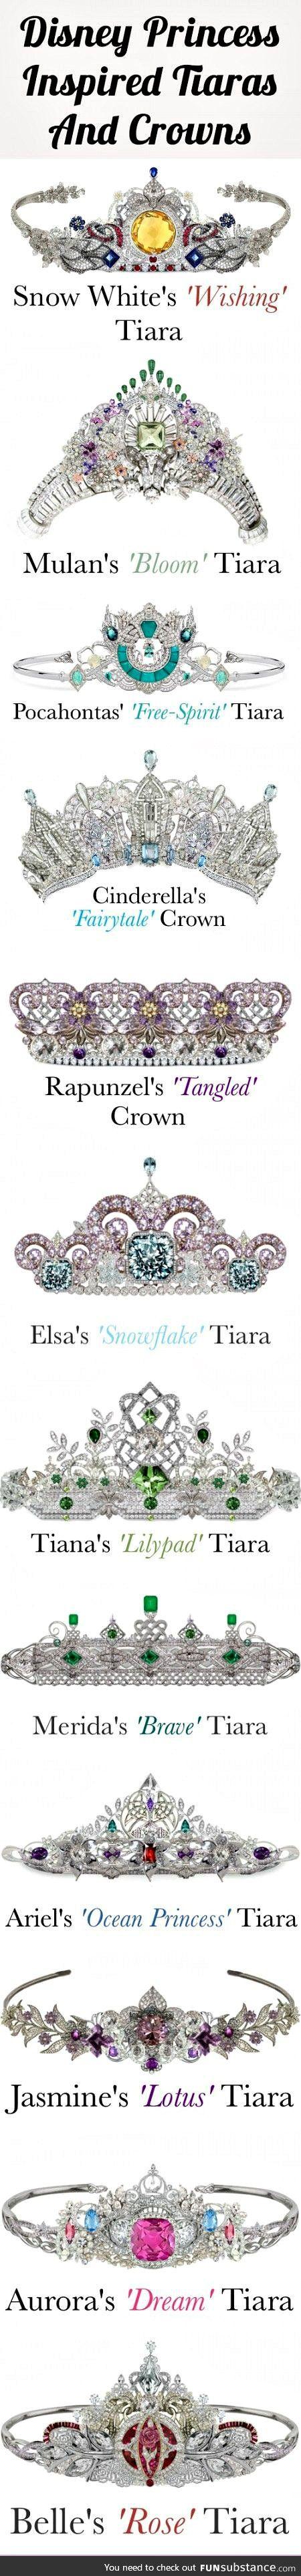 Disney-inspired tiaras